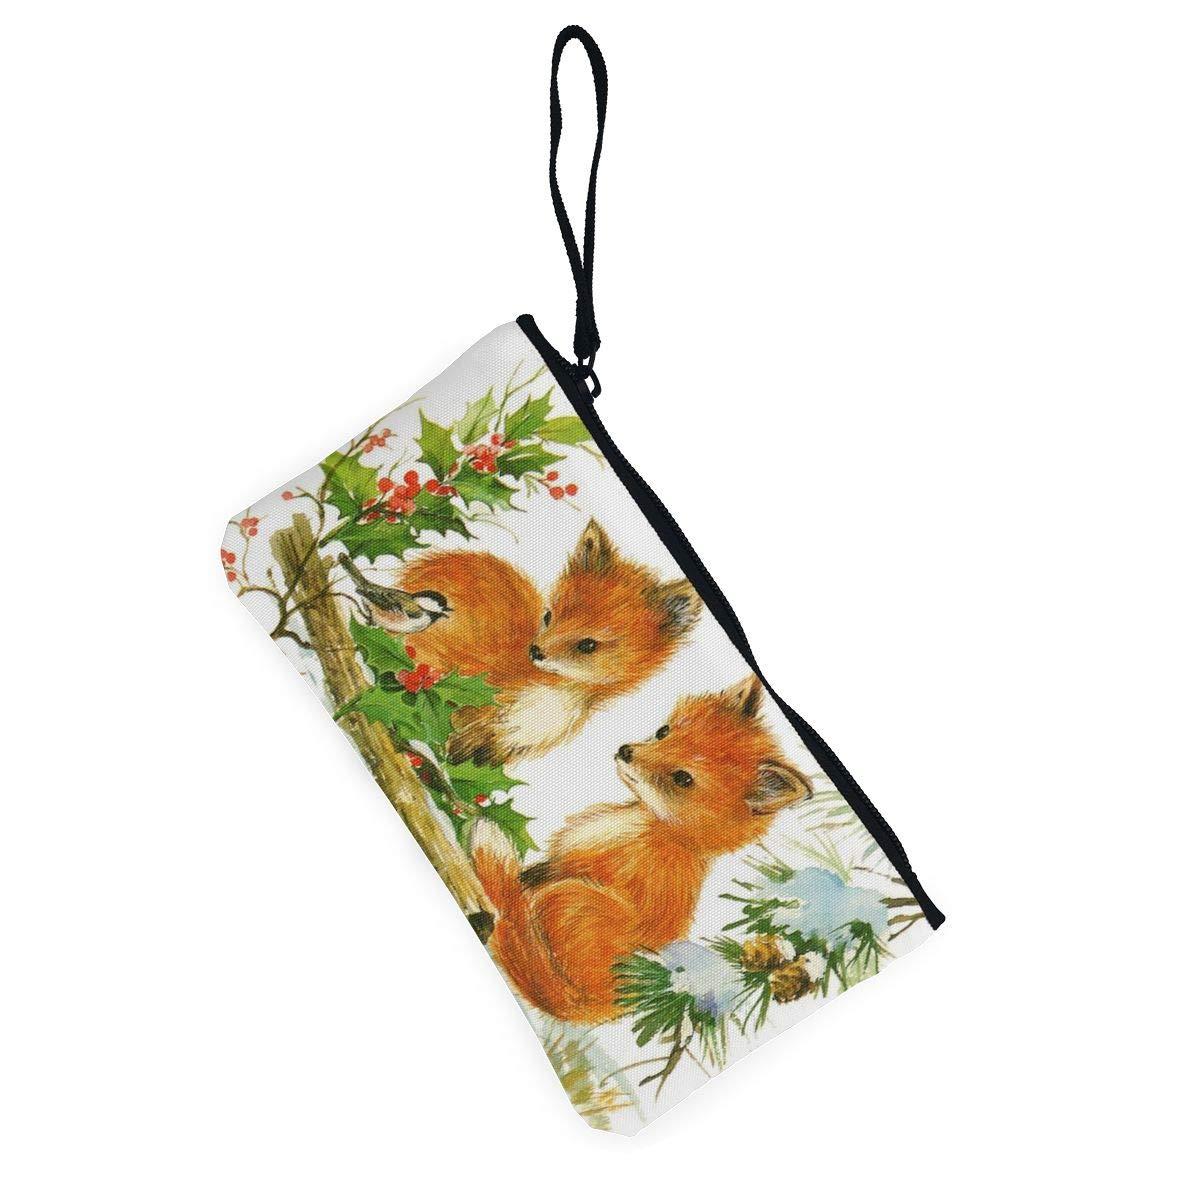 YUANSHAN Vintage Christmas Fox Unisex Canvas Coin Purse Change Cash Bag Zipper Small Purse Wallets with Handle